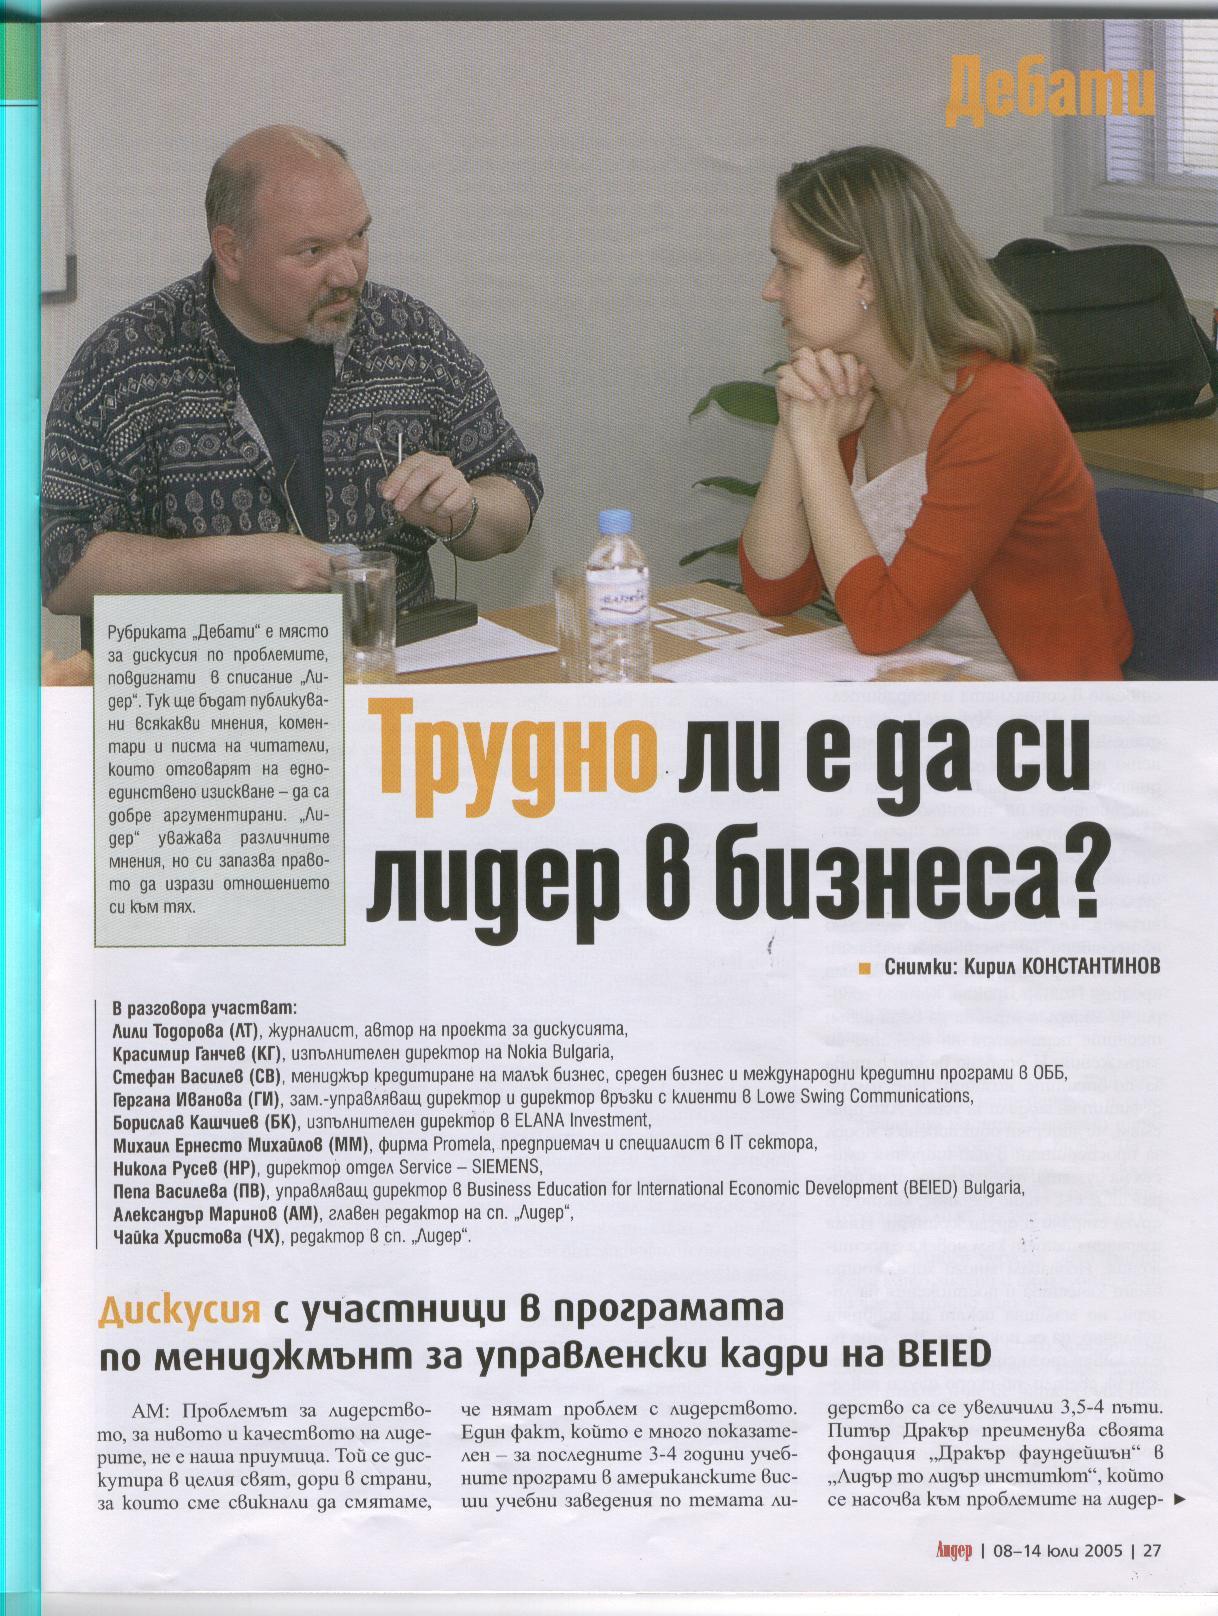 Leader Magazine 1